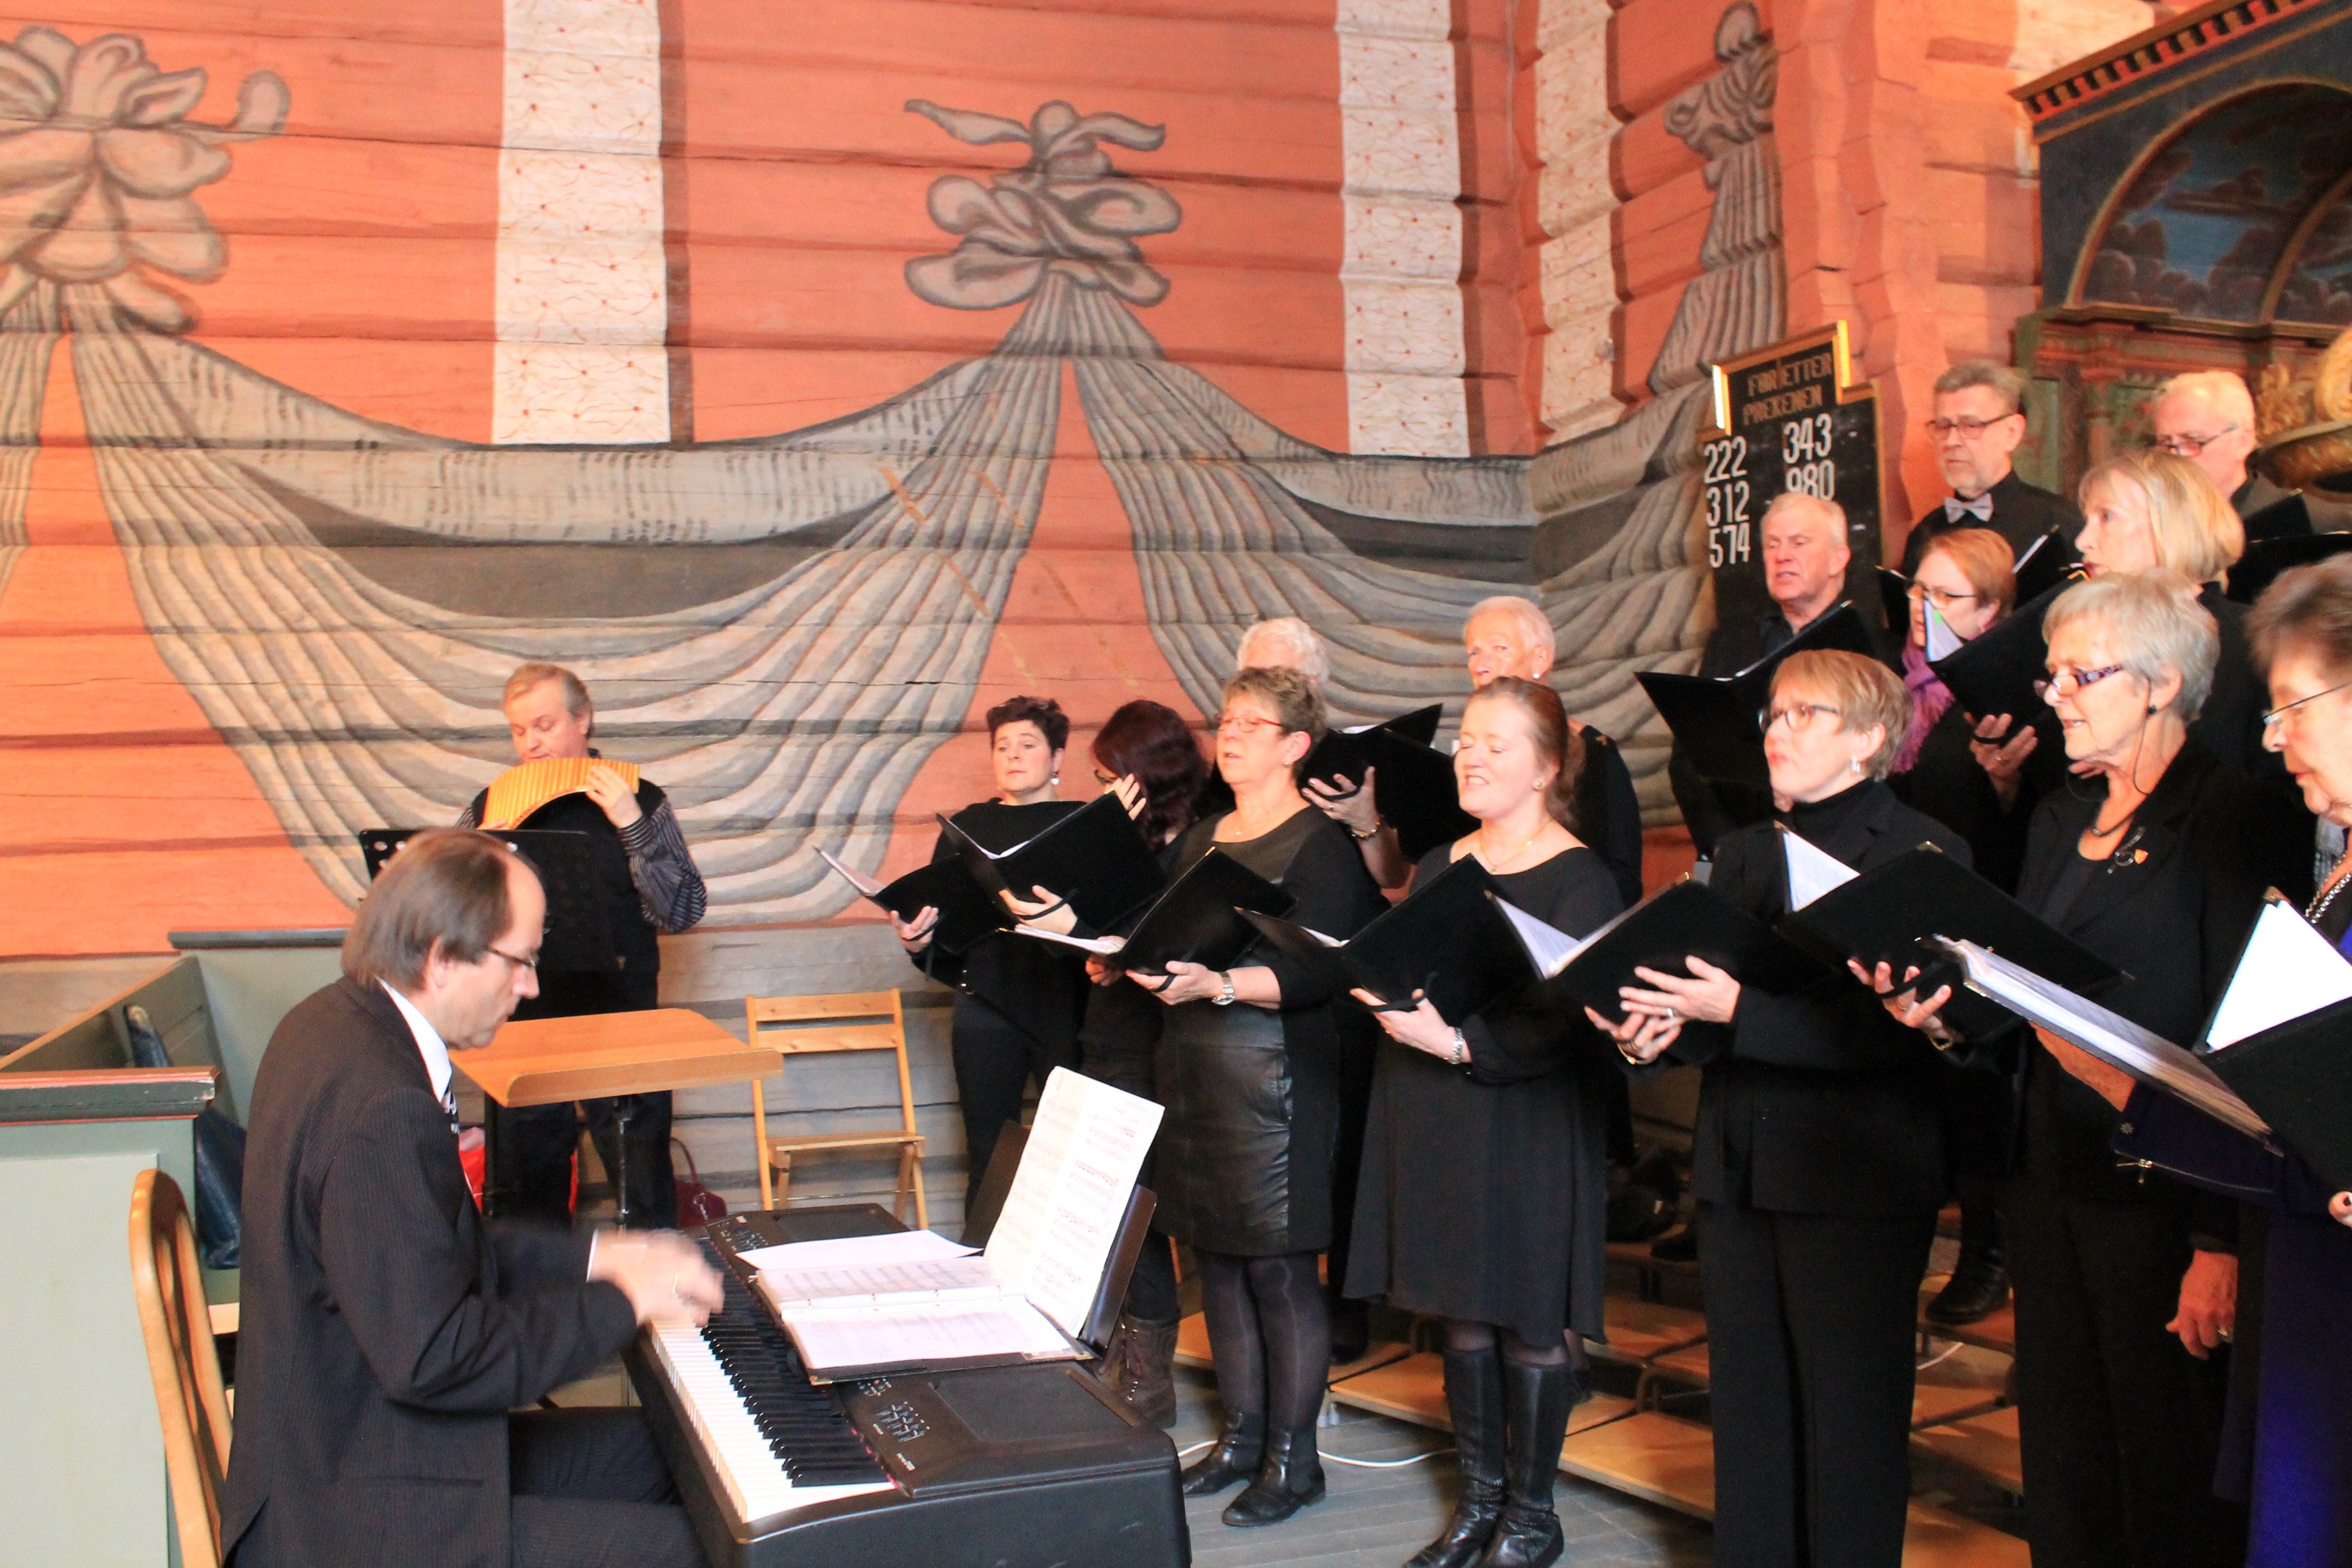 02 Konsert med Roar Engelberg Svarstad kirke 8987